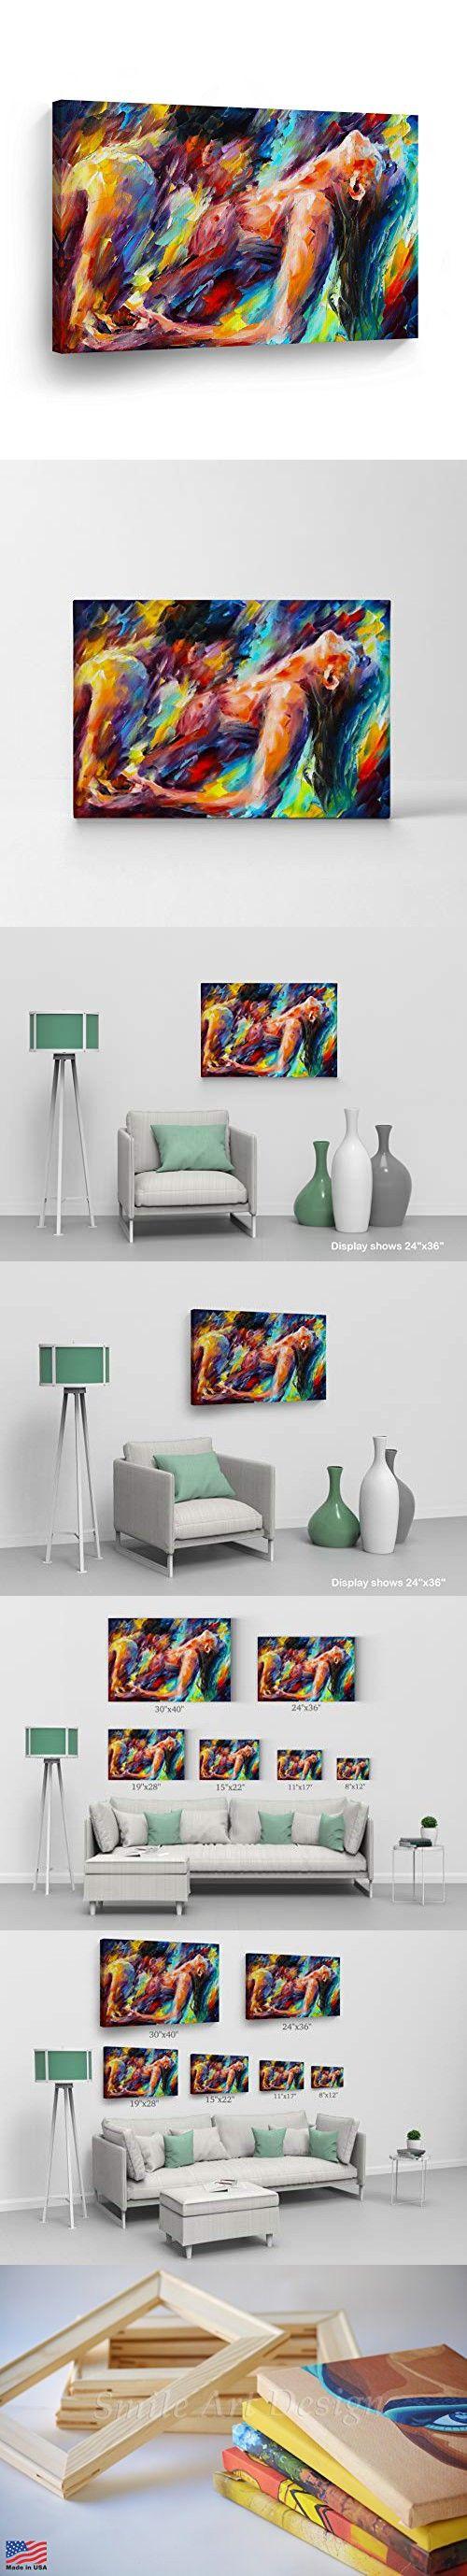 Man woman making love canvas Pin On Wall Decor